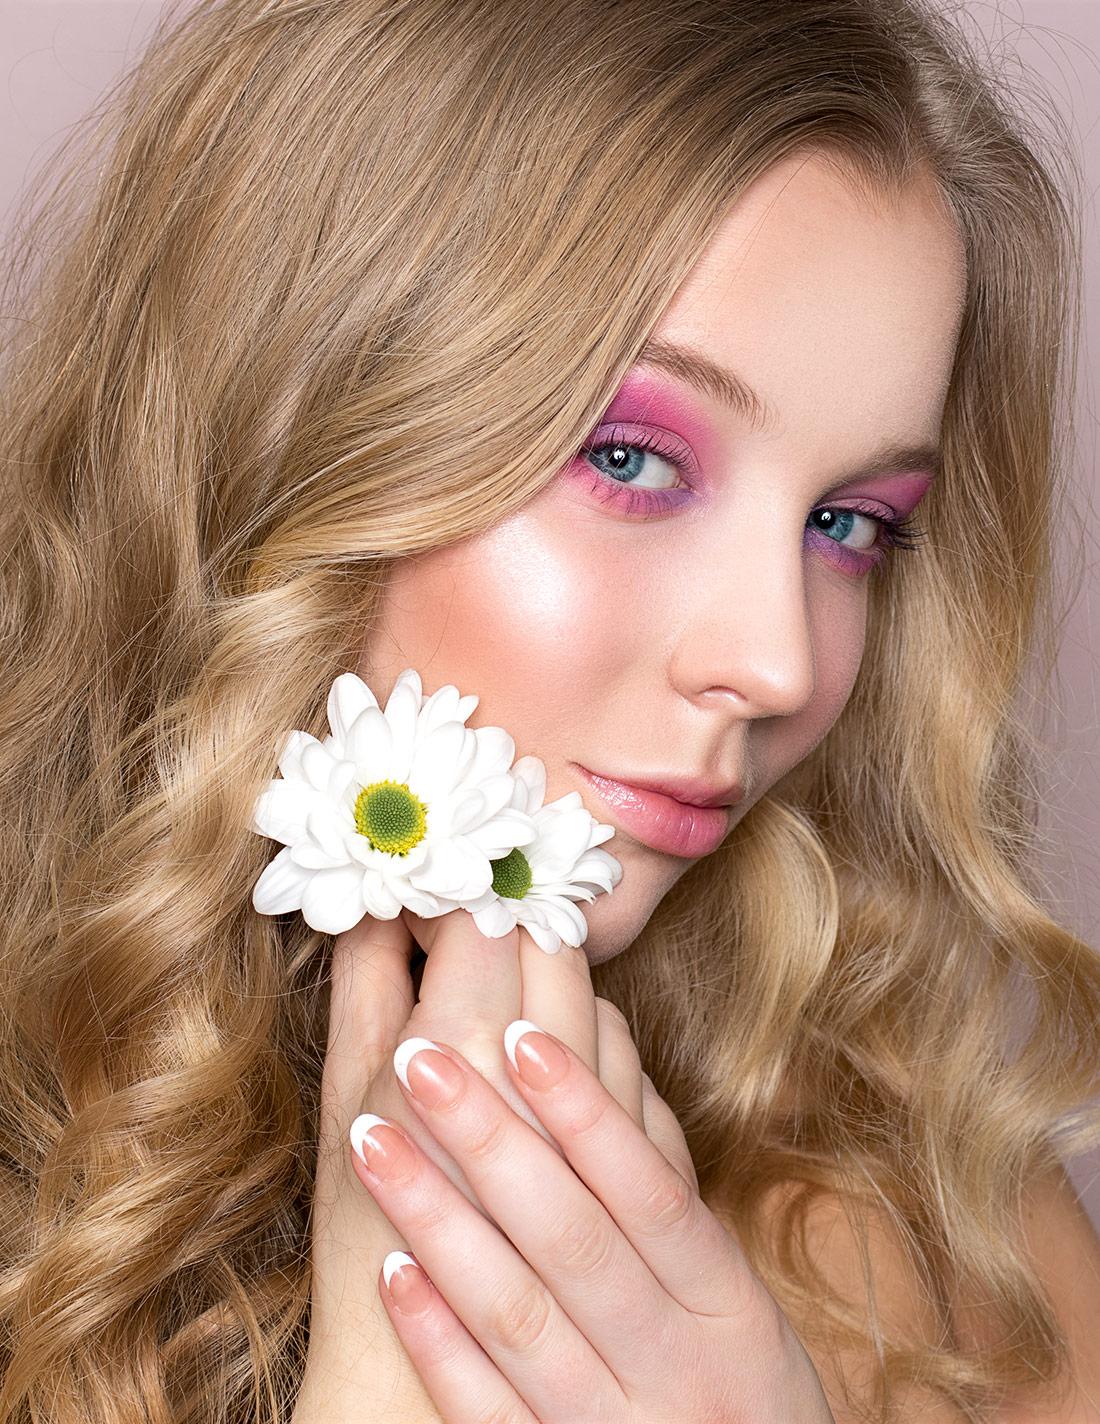 Flower-beauty_4_LR.jpg